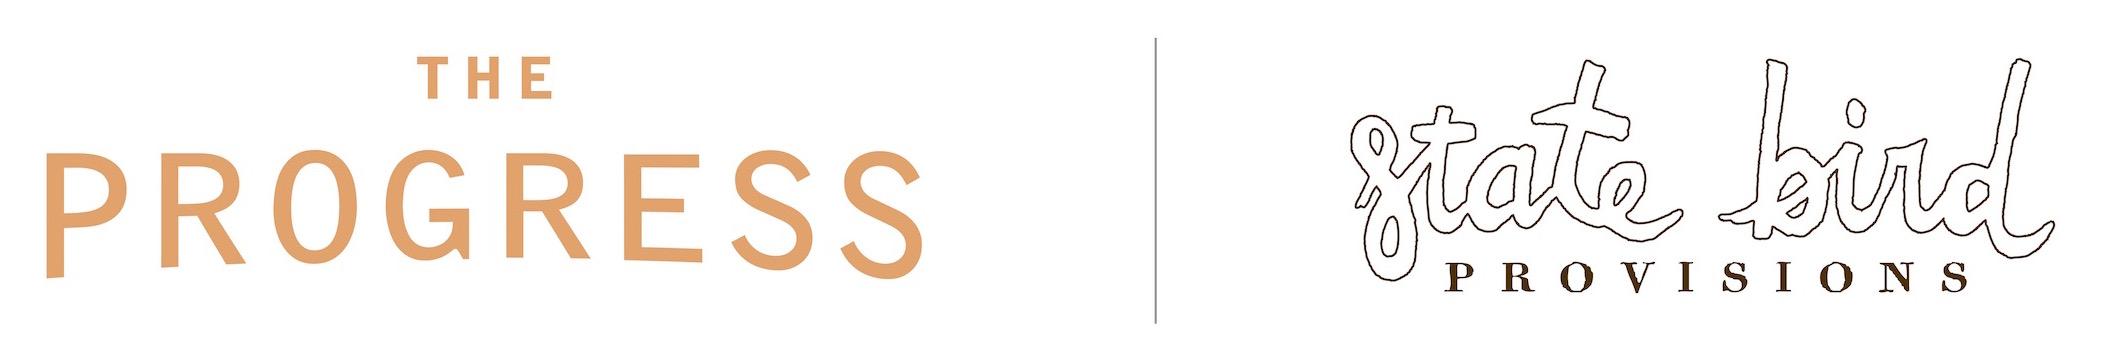 Dual logo.jpg